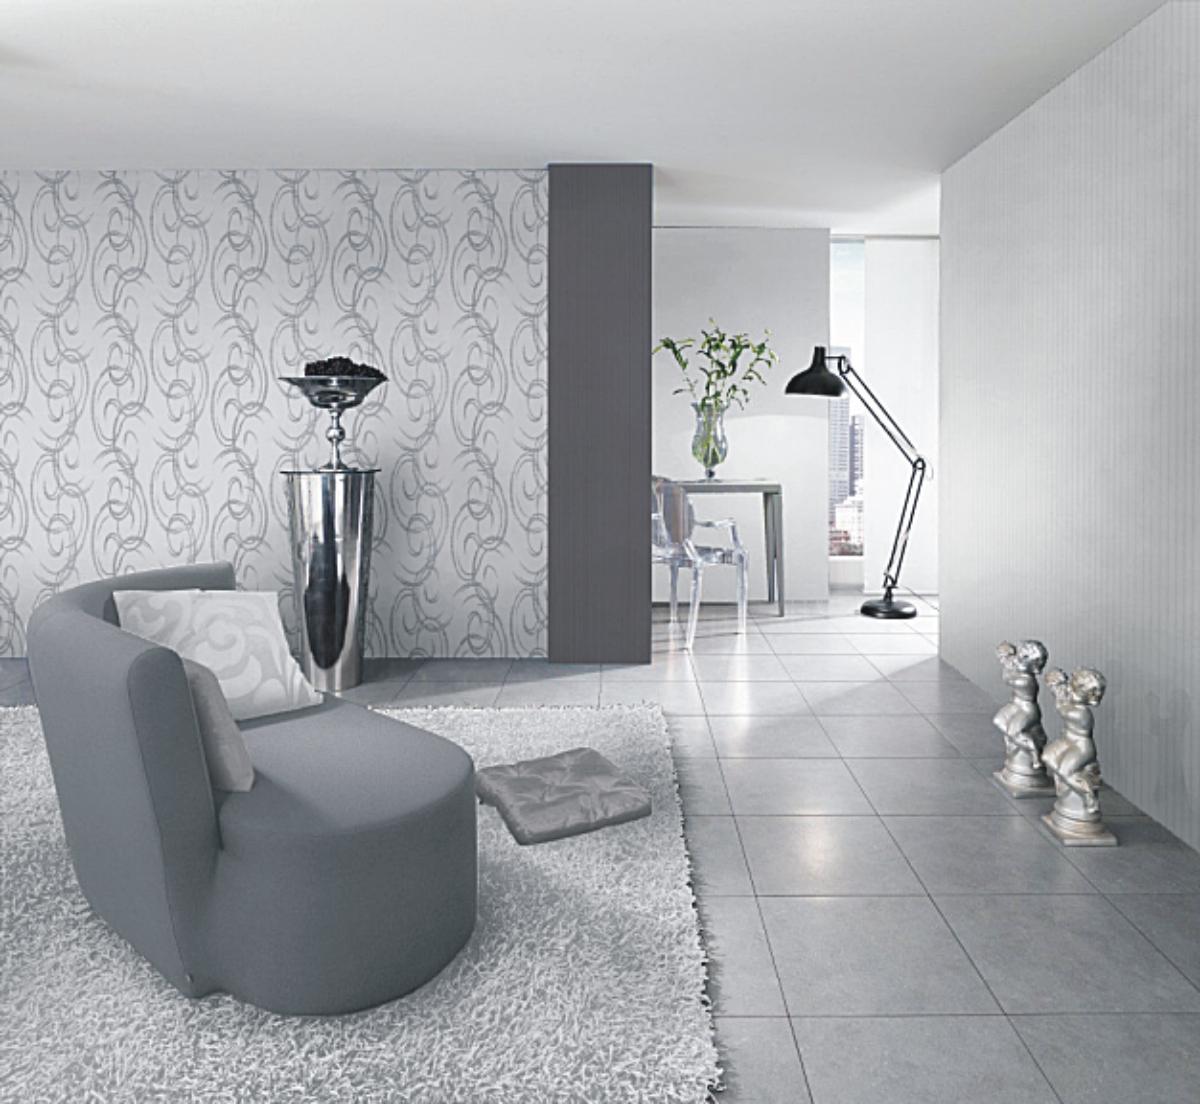 barbara becker tapeten tapete barbara becker 2012 home passion 769562 neu barbara becker. Black Bedroom Furniture Sets. Home Design Ideas